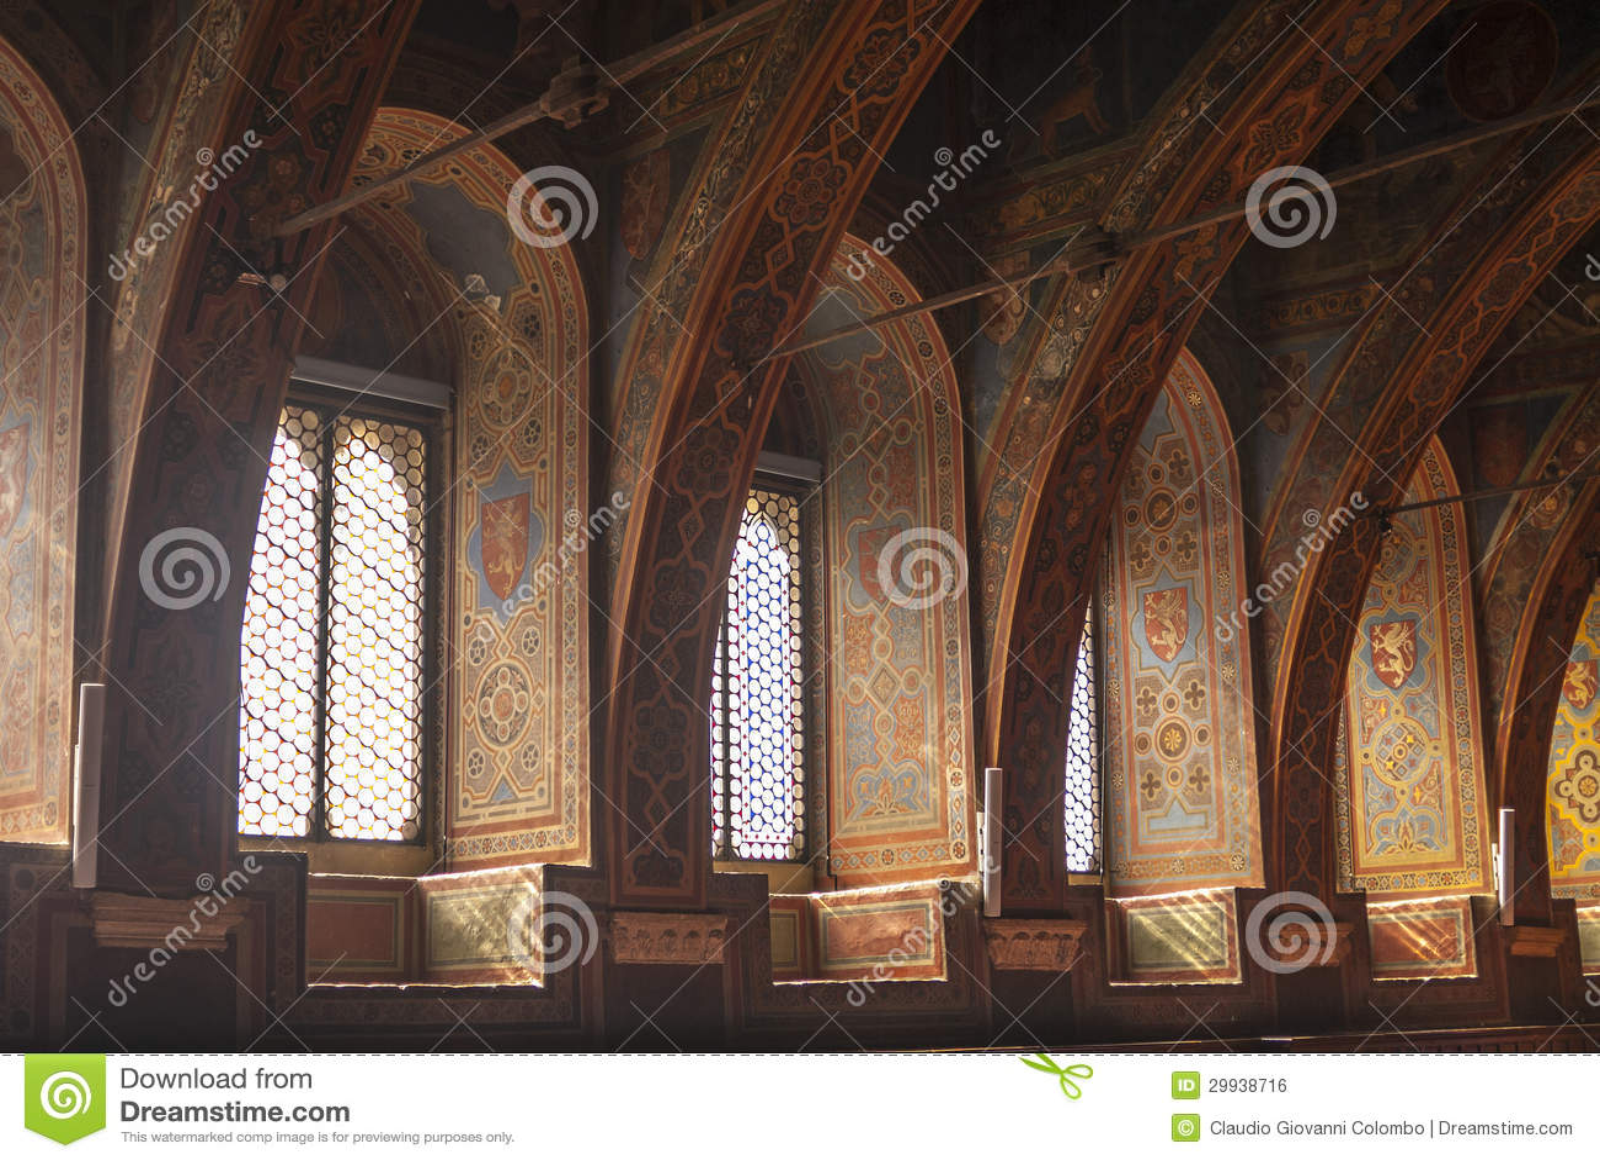 Perugia interior of historic palace royalty free stock image image 29938716 - Interior design perugia ...